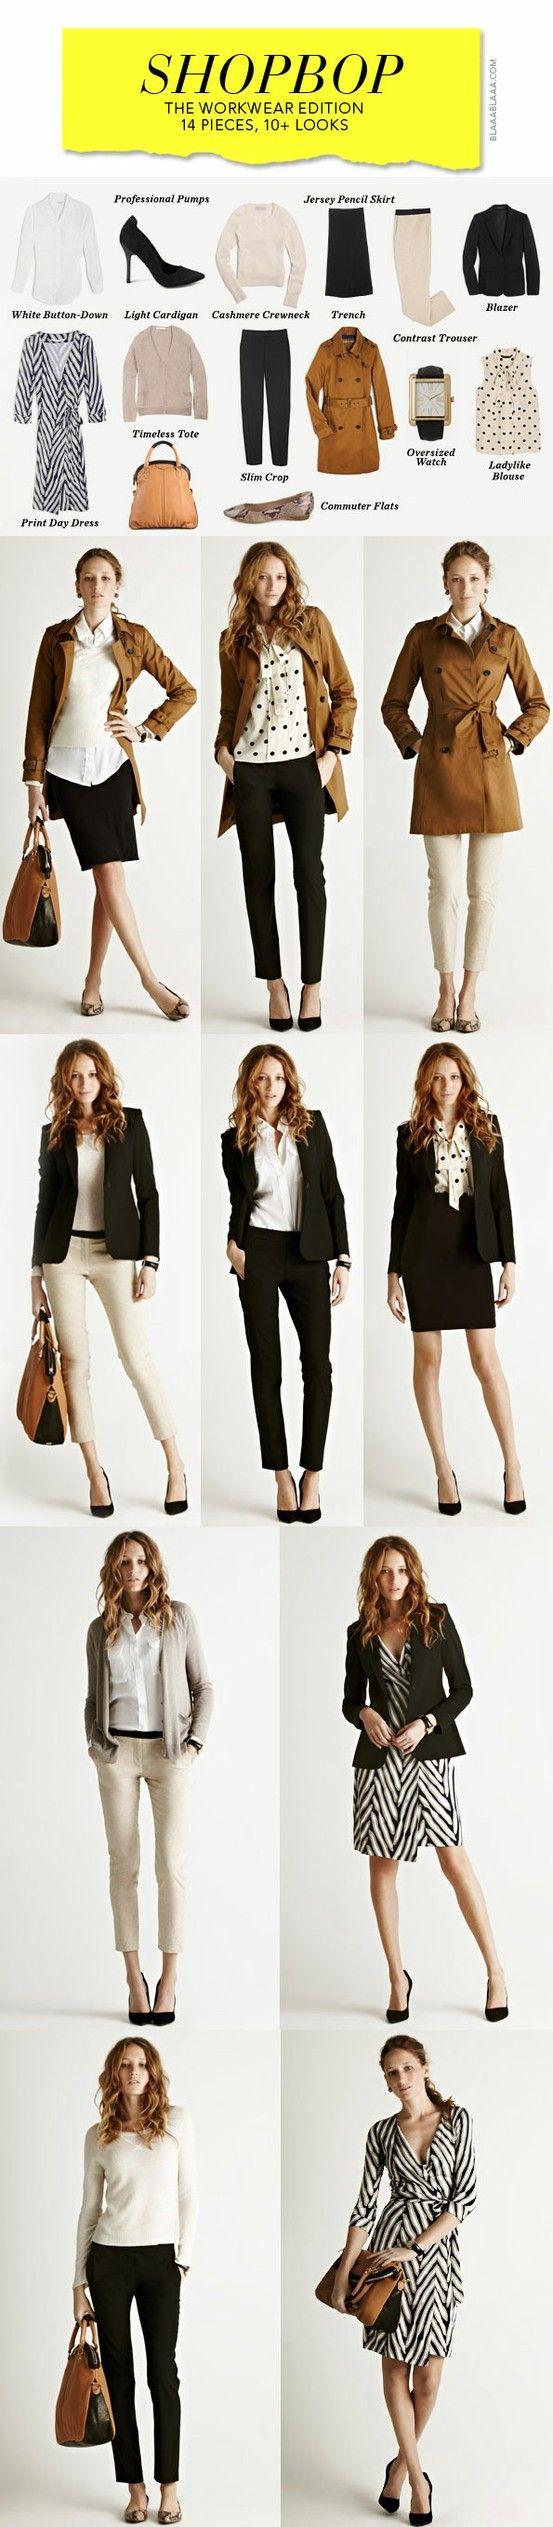 Idea.      work wardrobe with 14 pieces, 10+ looks #shopbop http://www.shopbop.com/ci/3/ww/workwear-ultimate-closet.html